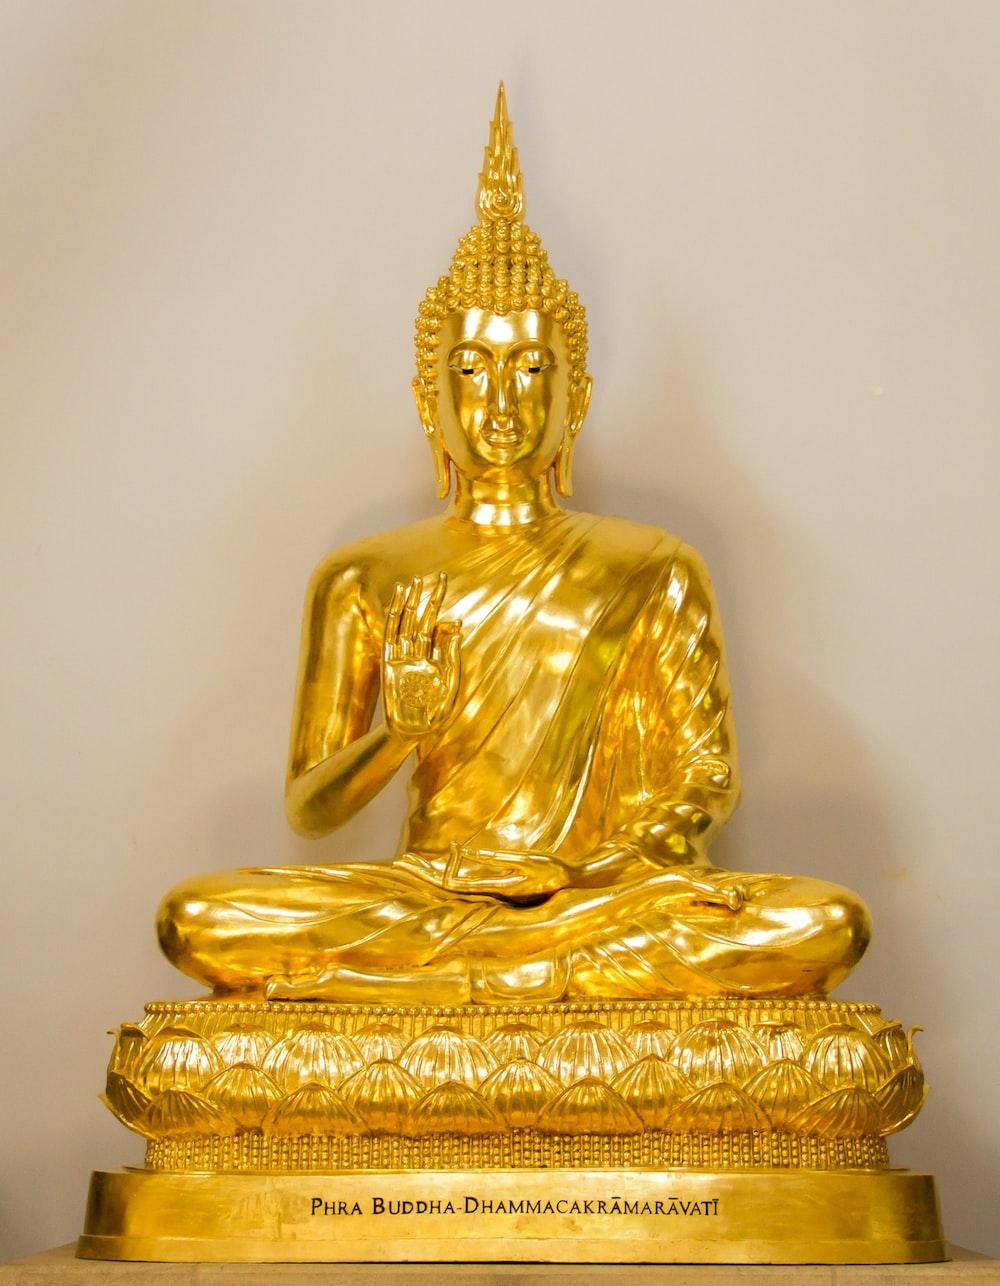 A golden religious statue.